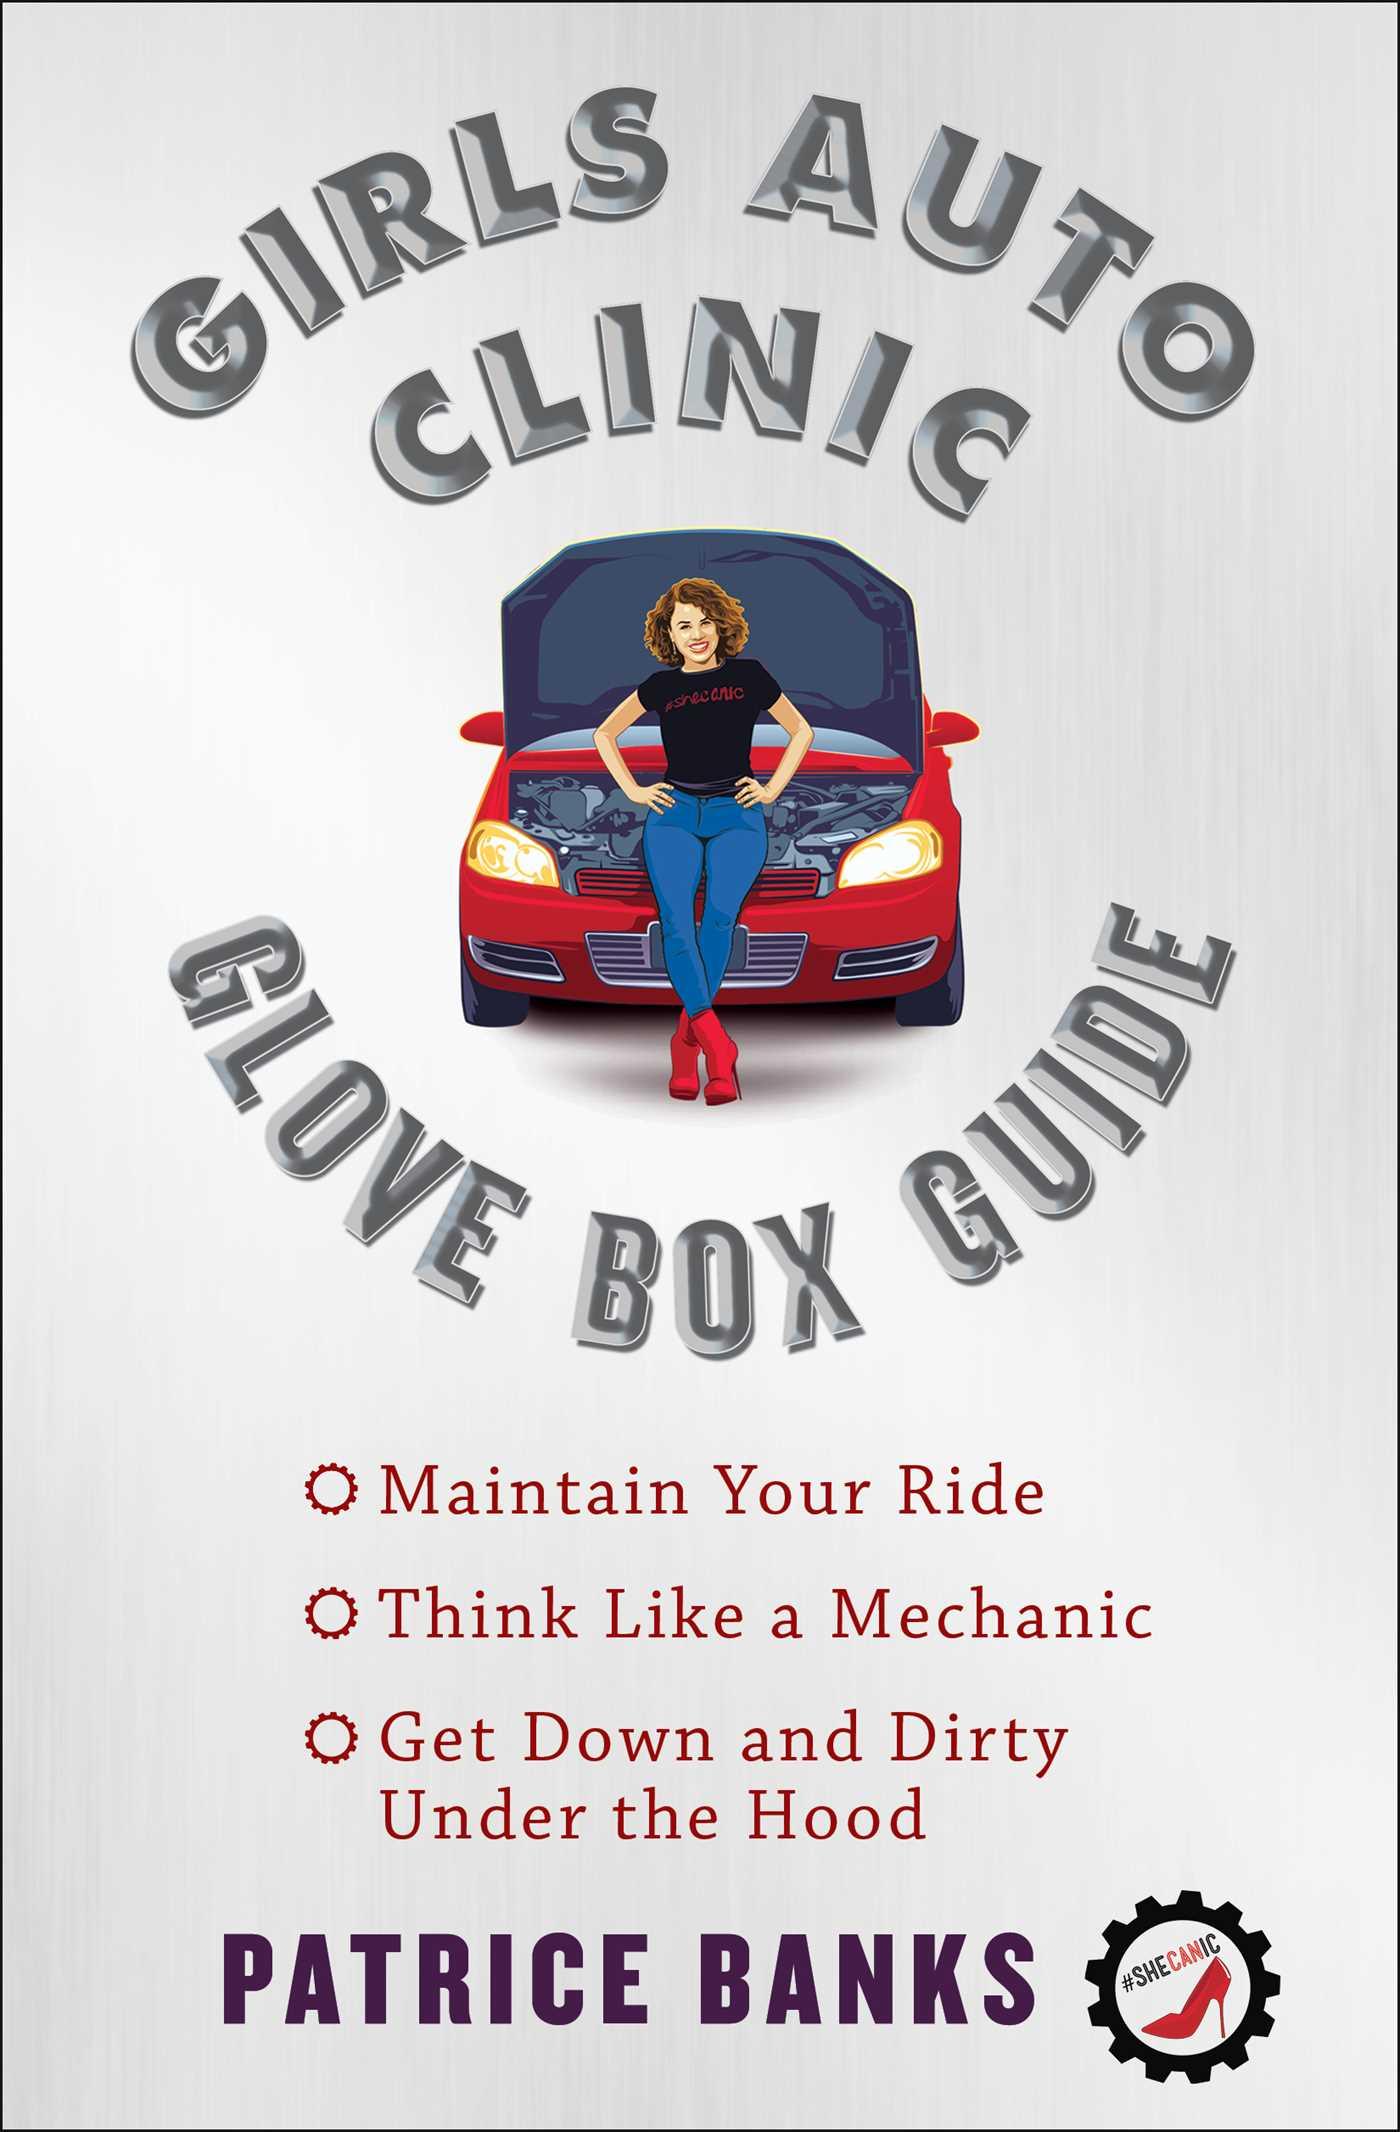 Girls auto clinic glove box guide 9781501144110 hr